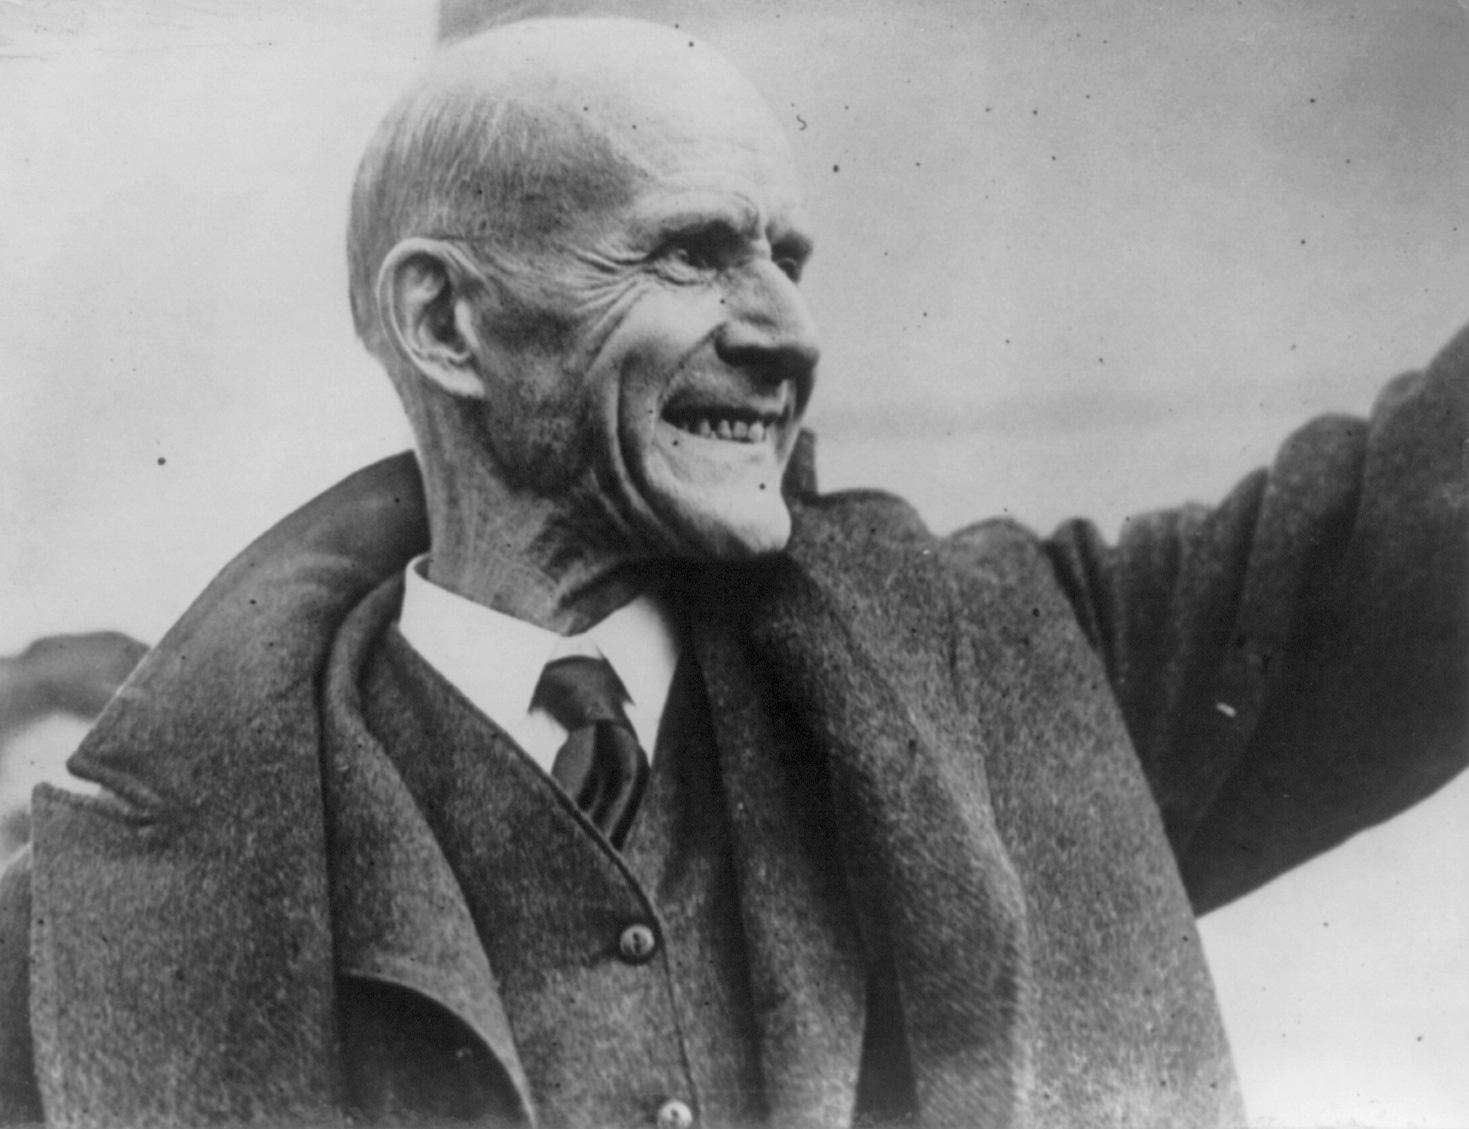 Eugene V. Debs, 1921. Image in the public domain, courtesy of Wikimedia Commons.